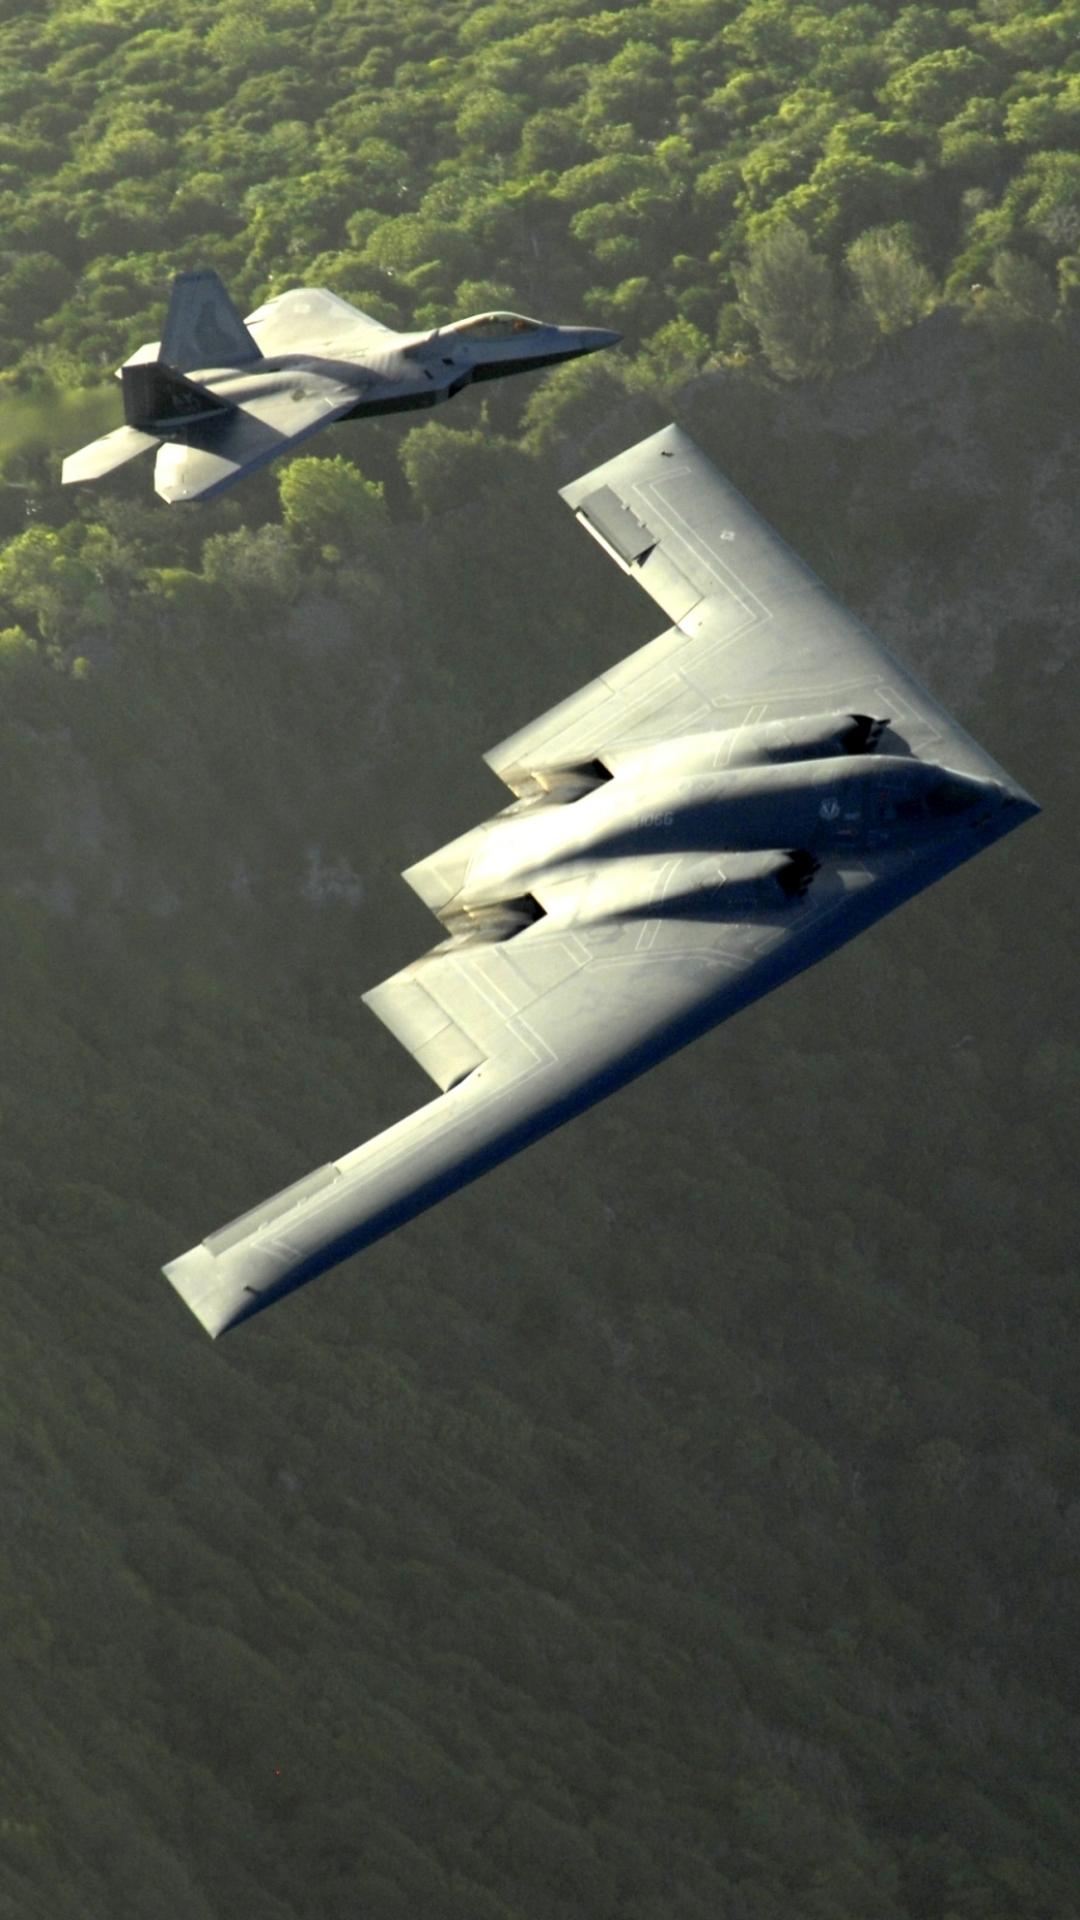 MilitaryNorthrop Grumman B 2 Spirit 1080x1920 Wallpaper ID 1080x1920